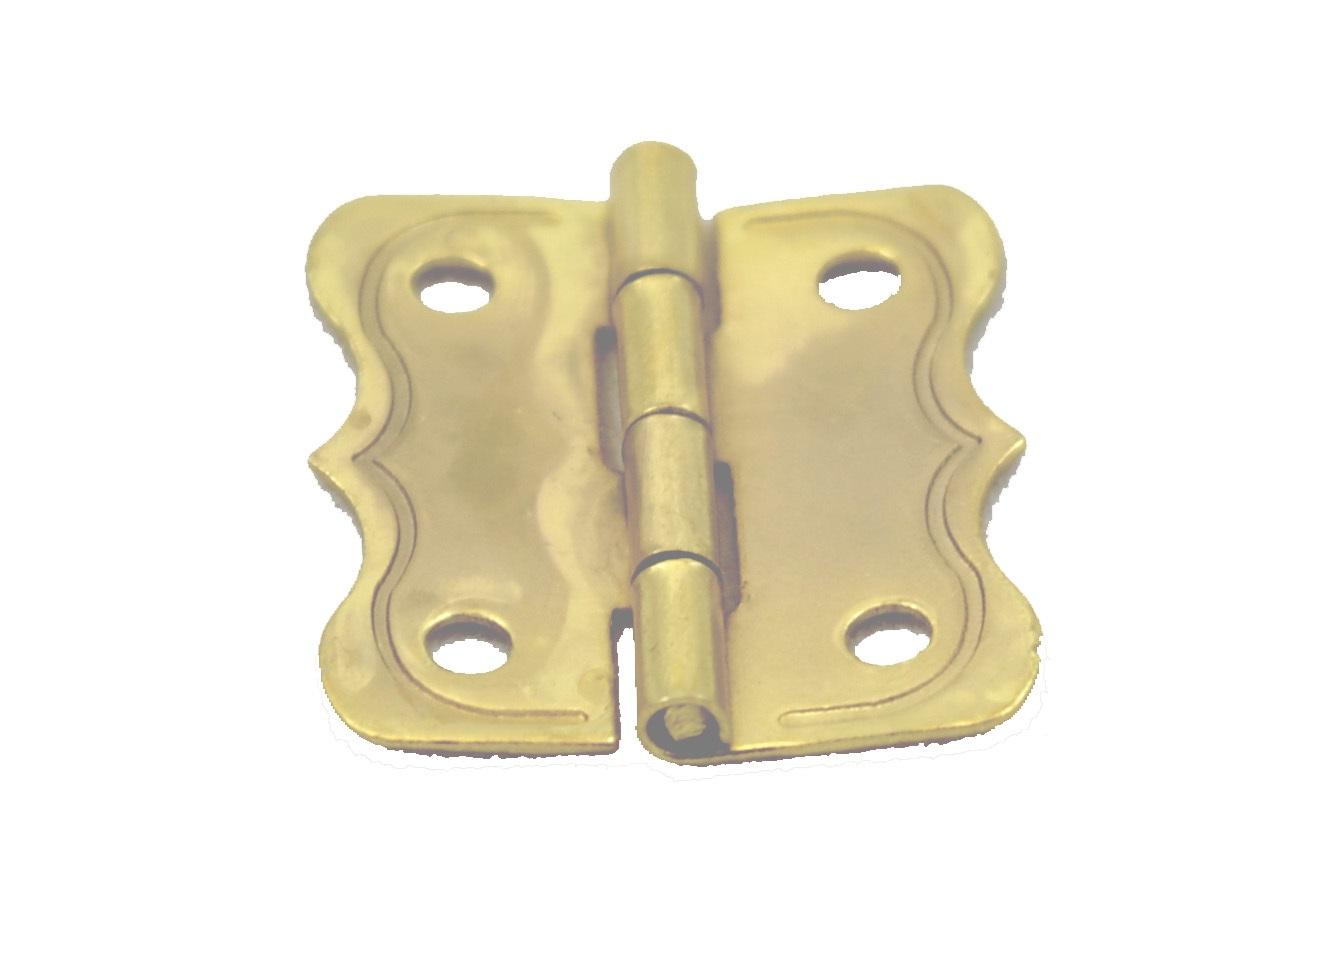 Fancy Brass Plated Steel Small Jewelry Box Hinge